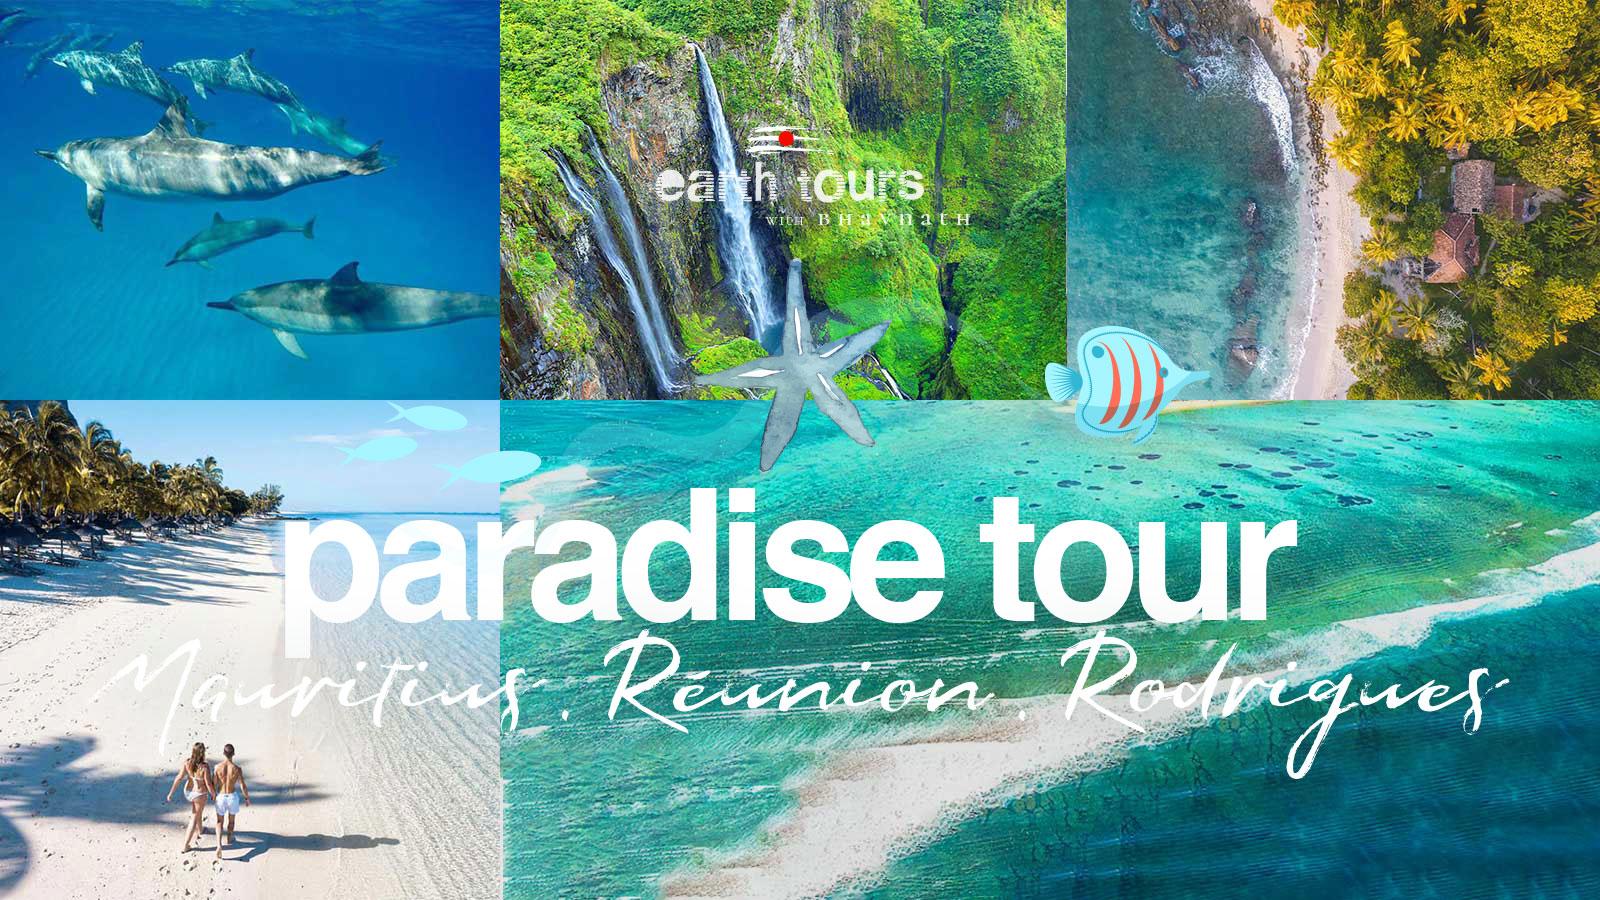 bhavcover_tour_paradise